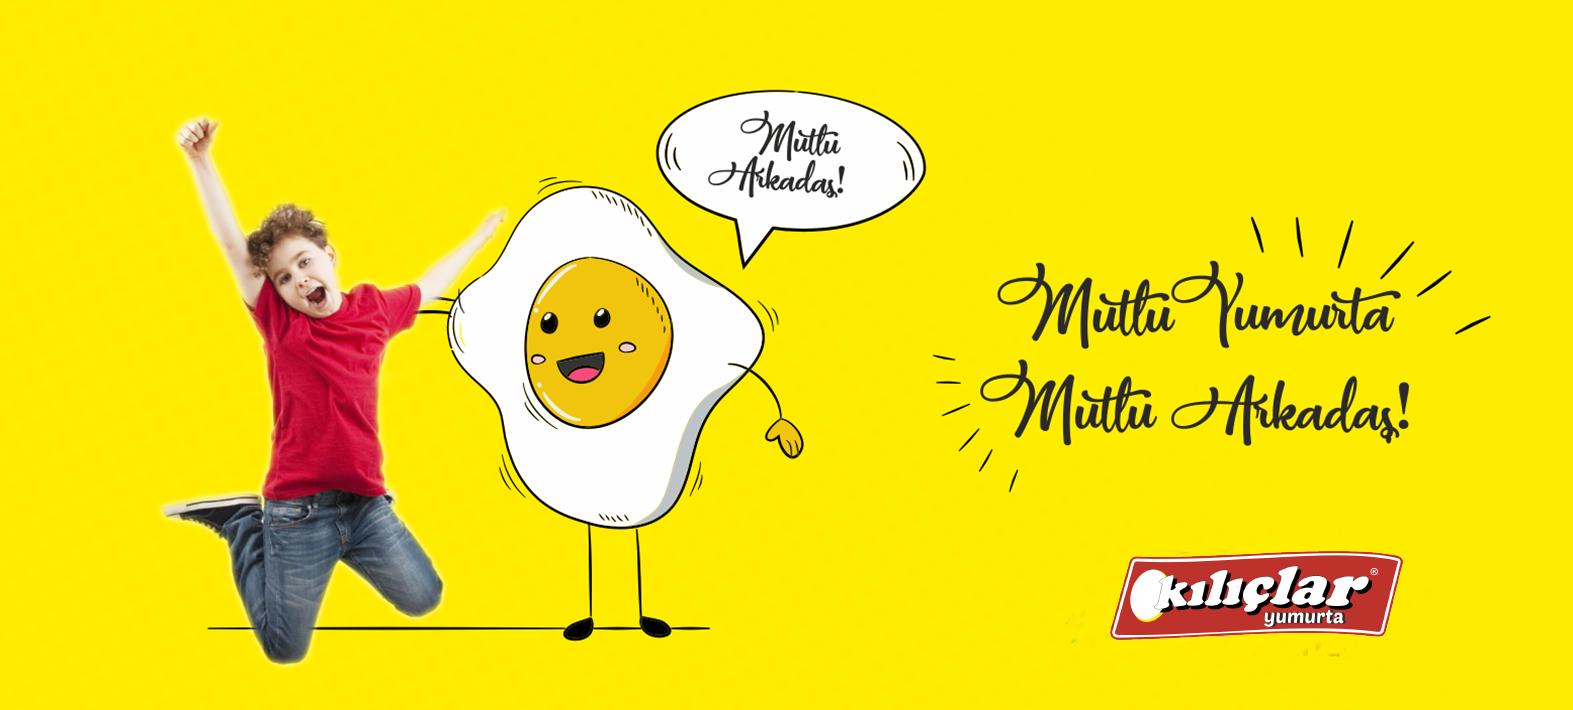 Mutlu Yumurta Mutlu Arkadaş